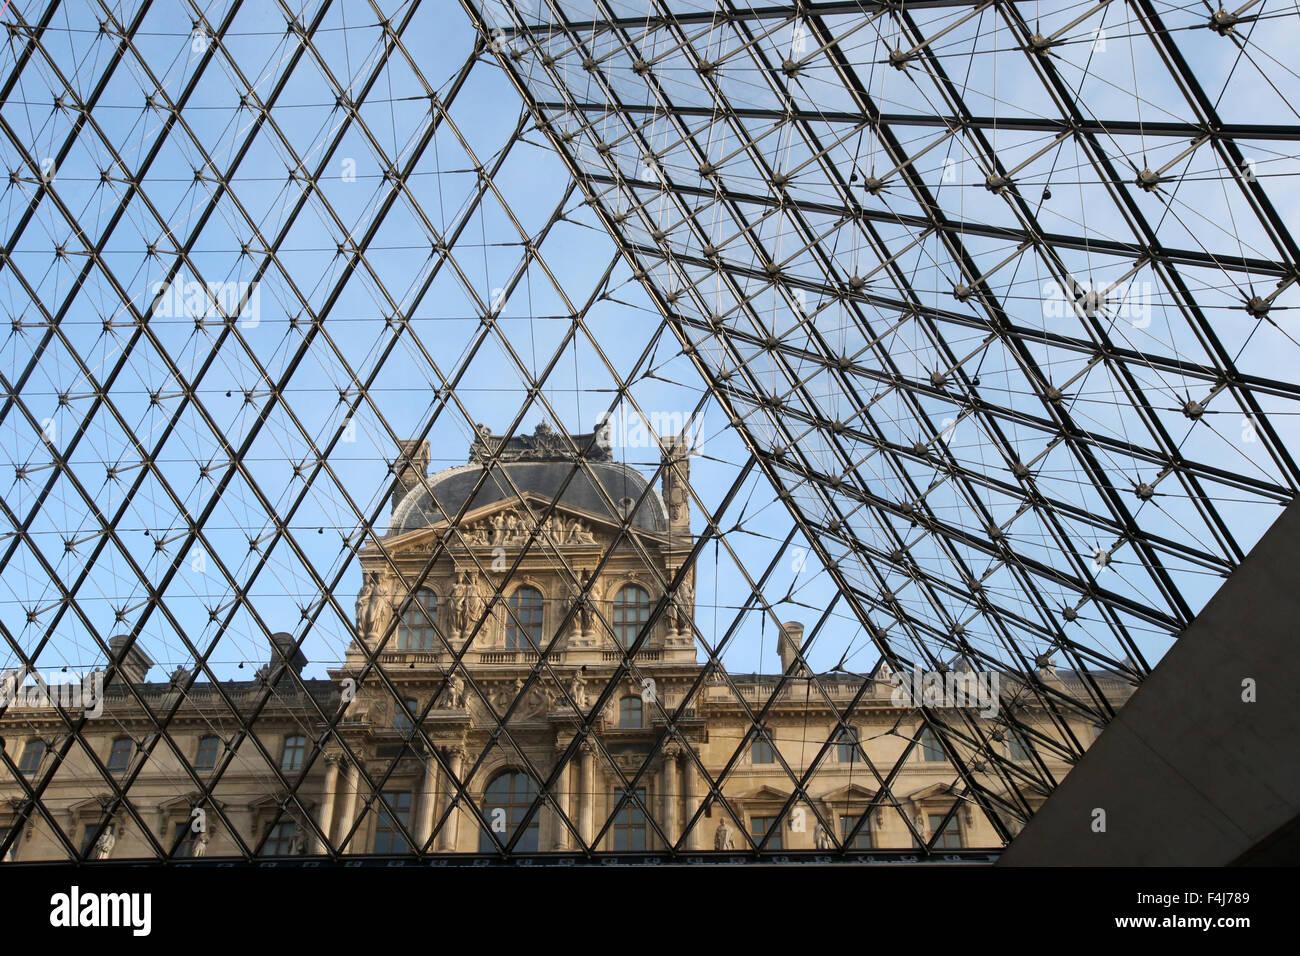 Palais du Louvre vistos a través de la pirámide, París, Francia, Europa Imagen De Stock